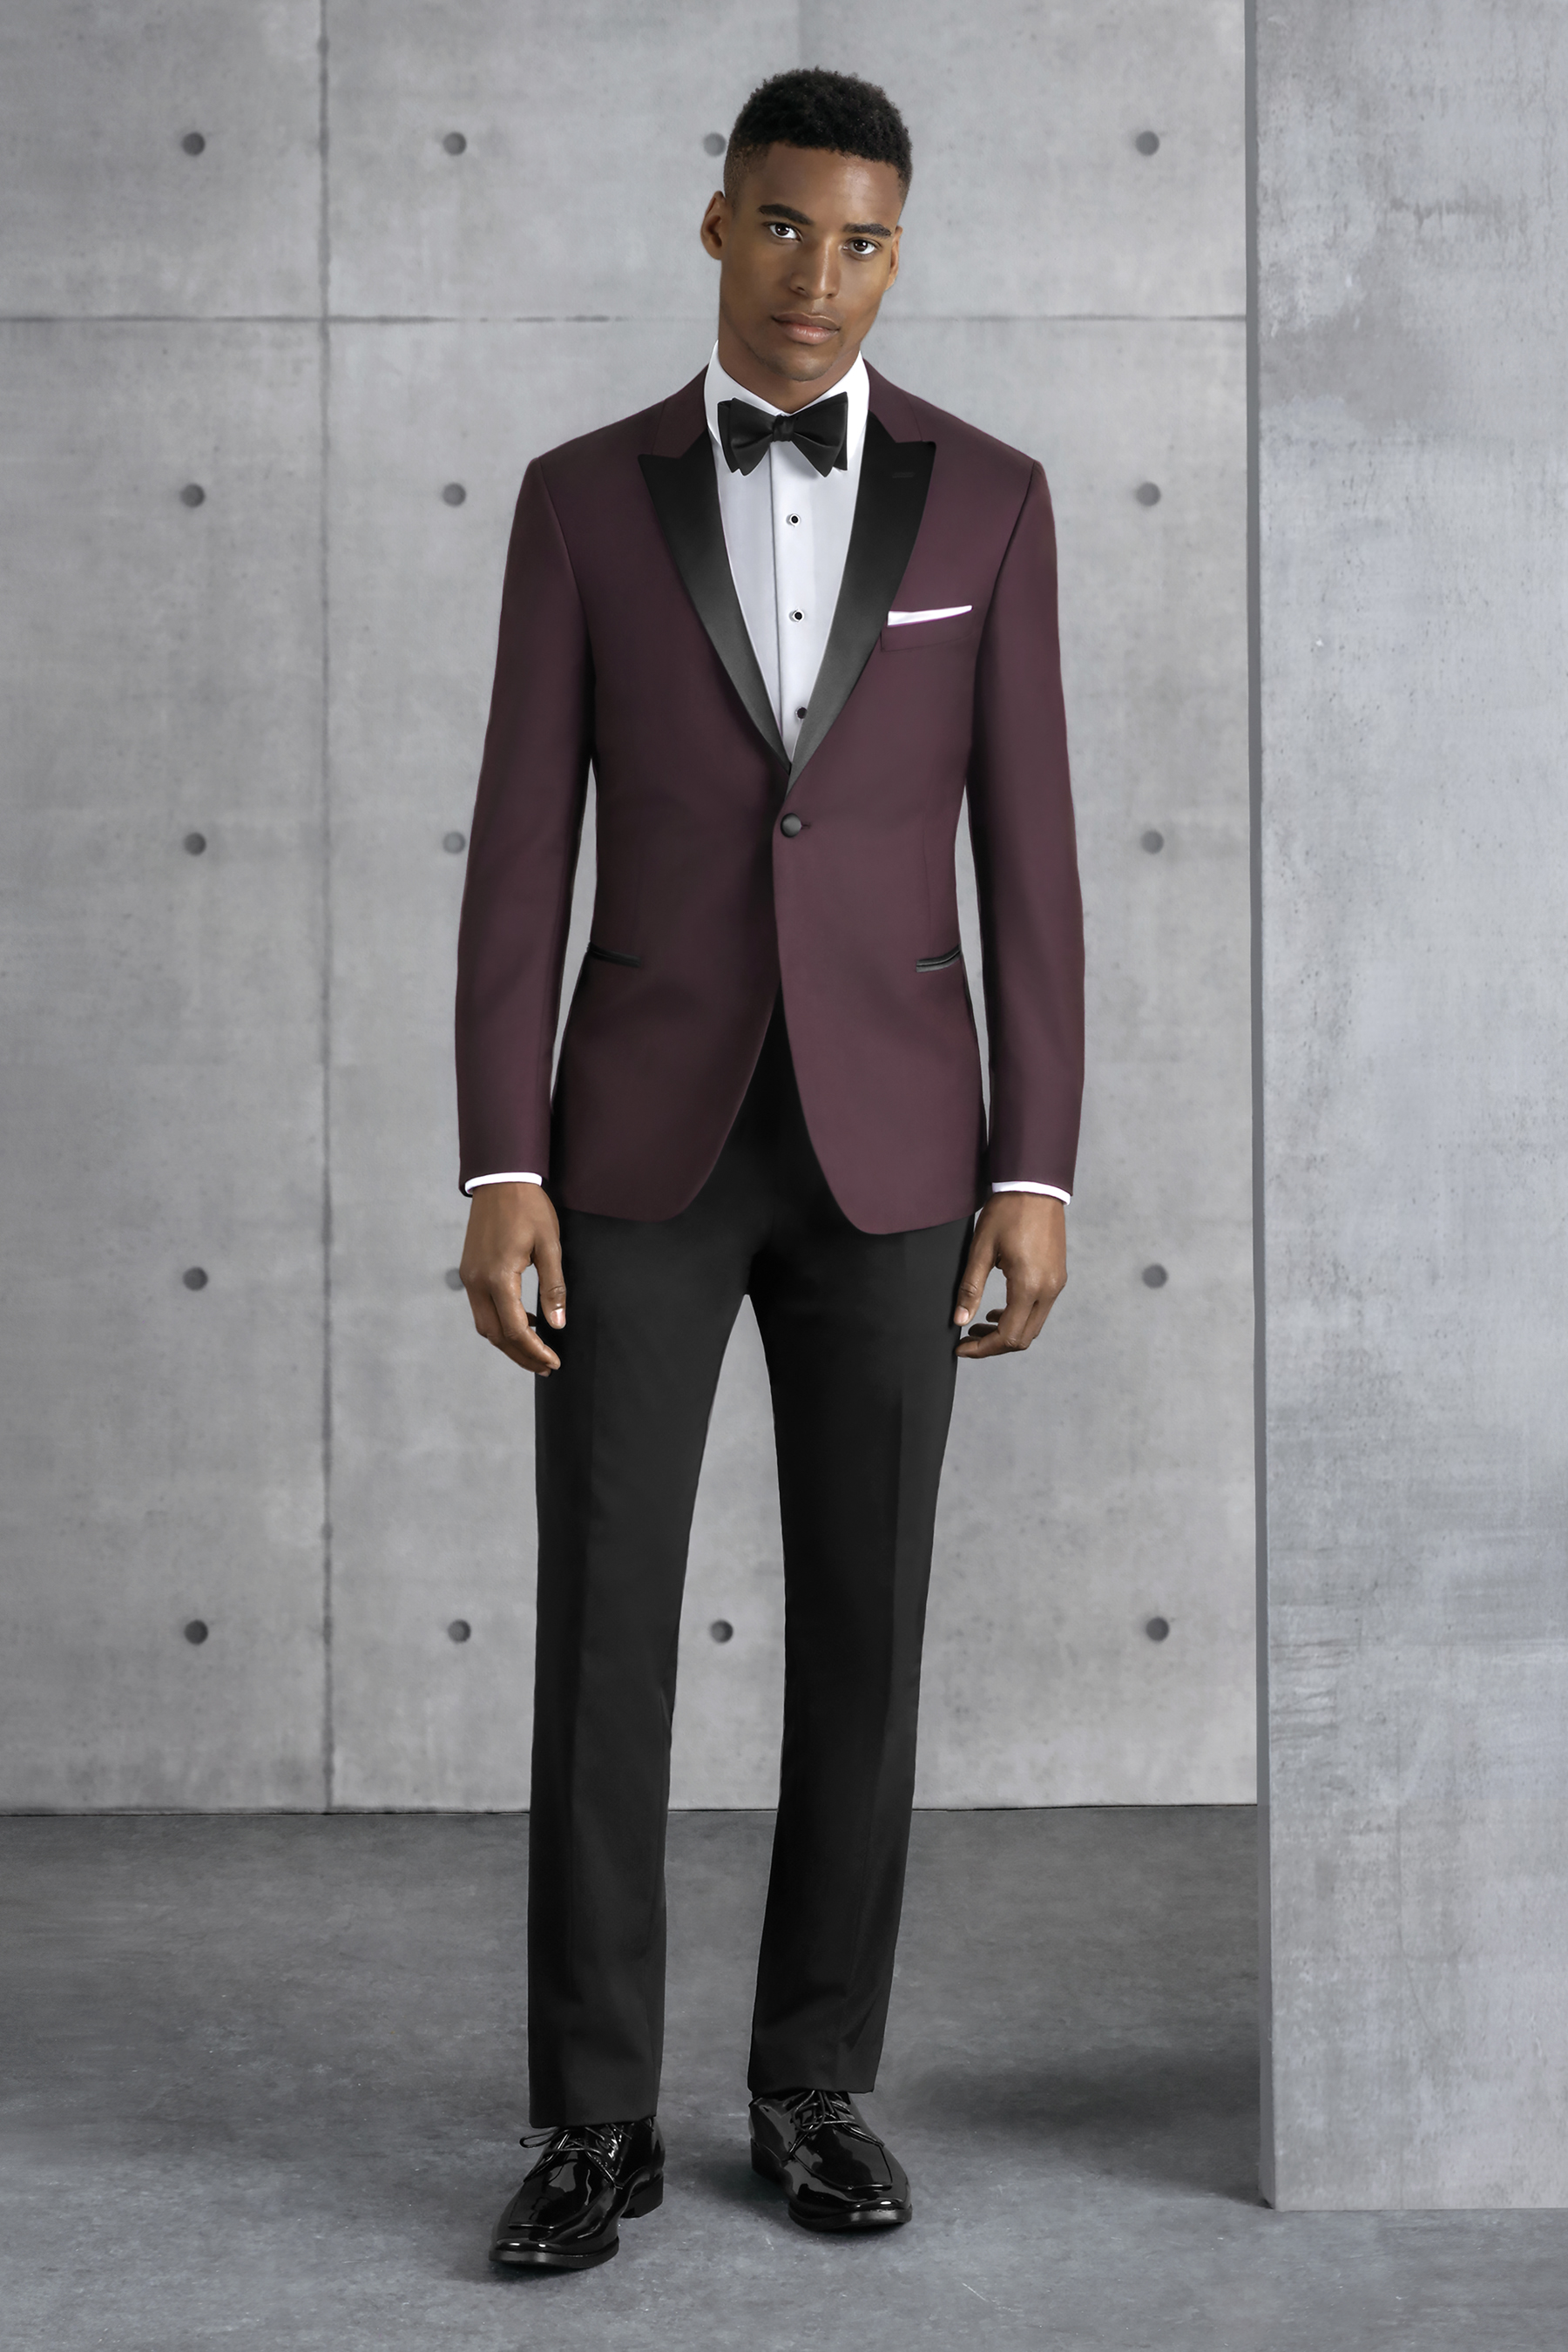 201_burgundy_empire_tuxedo-19-1